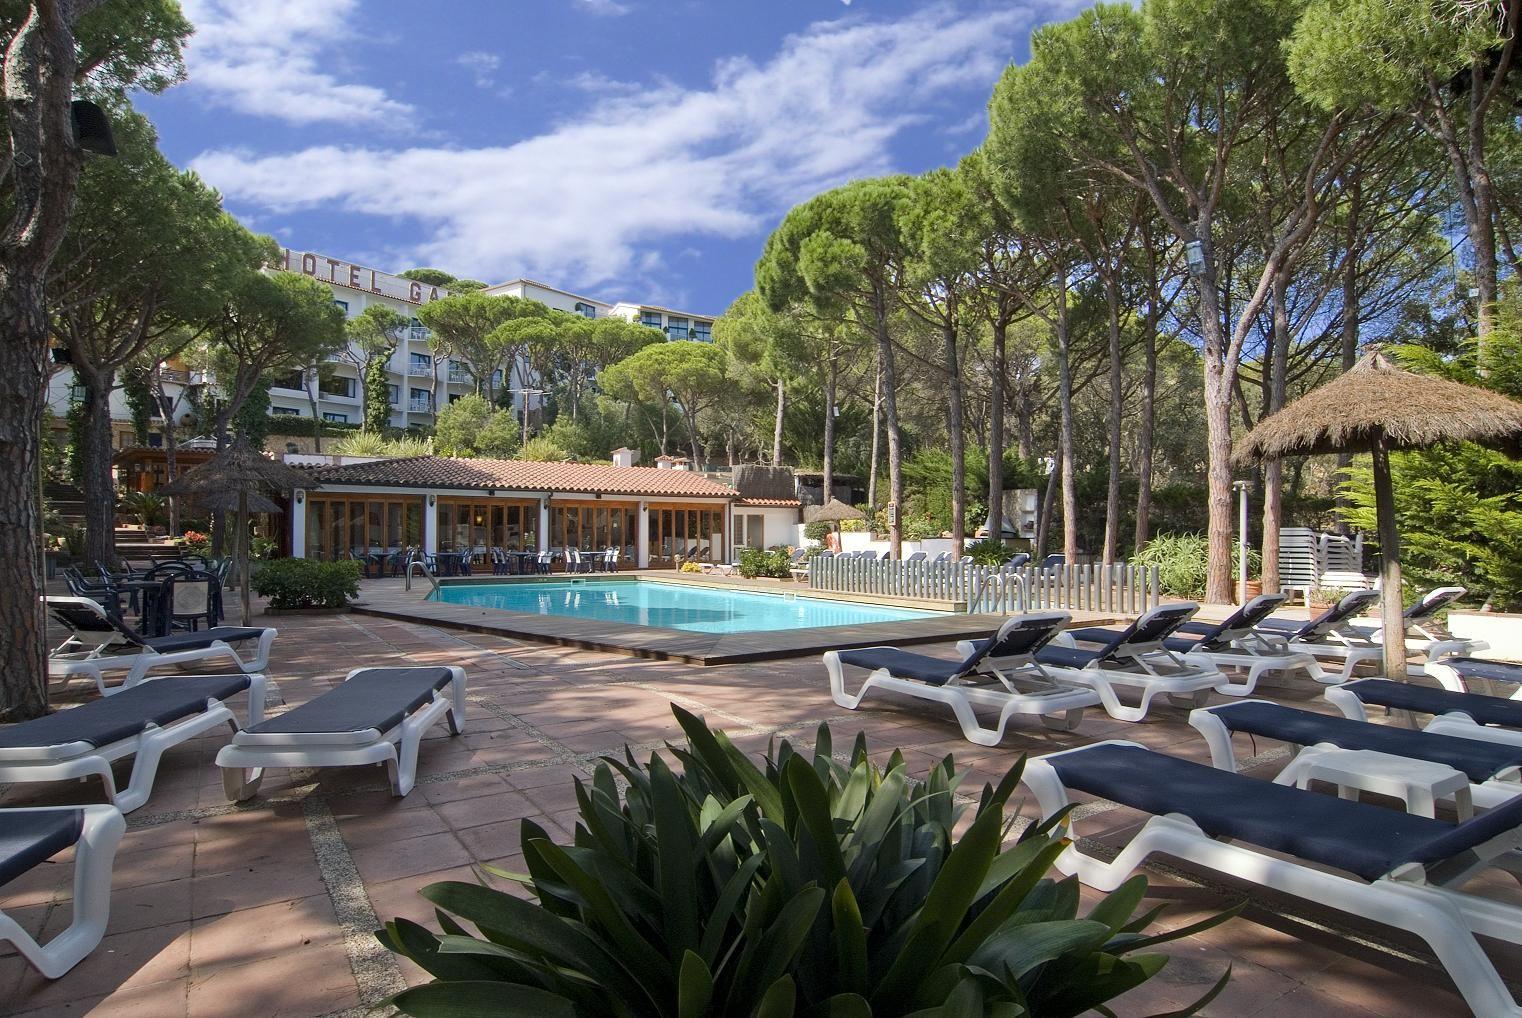 Hotel Garbi, Calella de Palafrugell, Costa Brava Hoteles